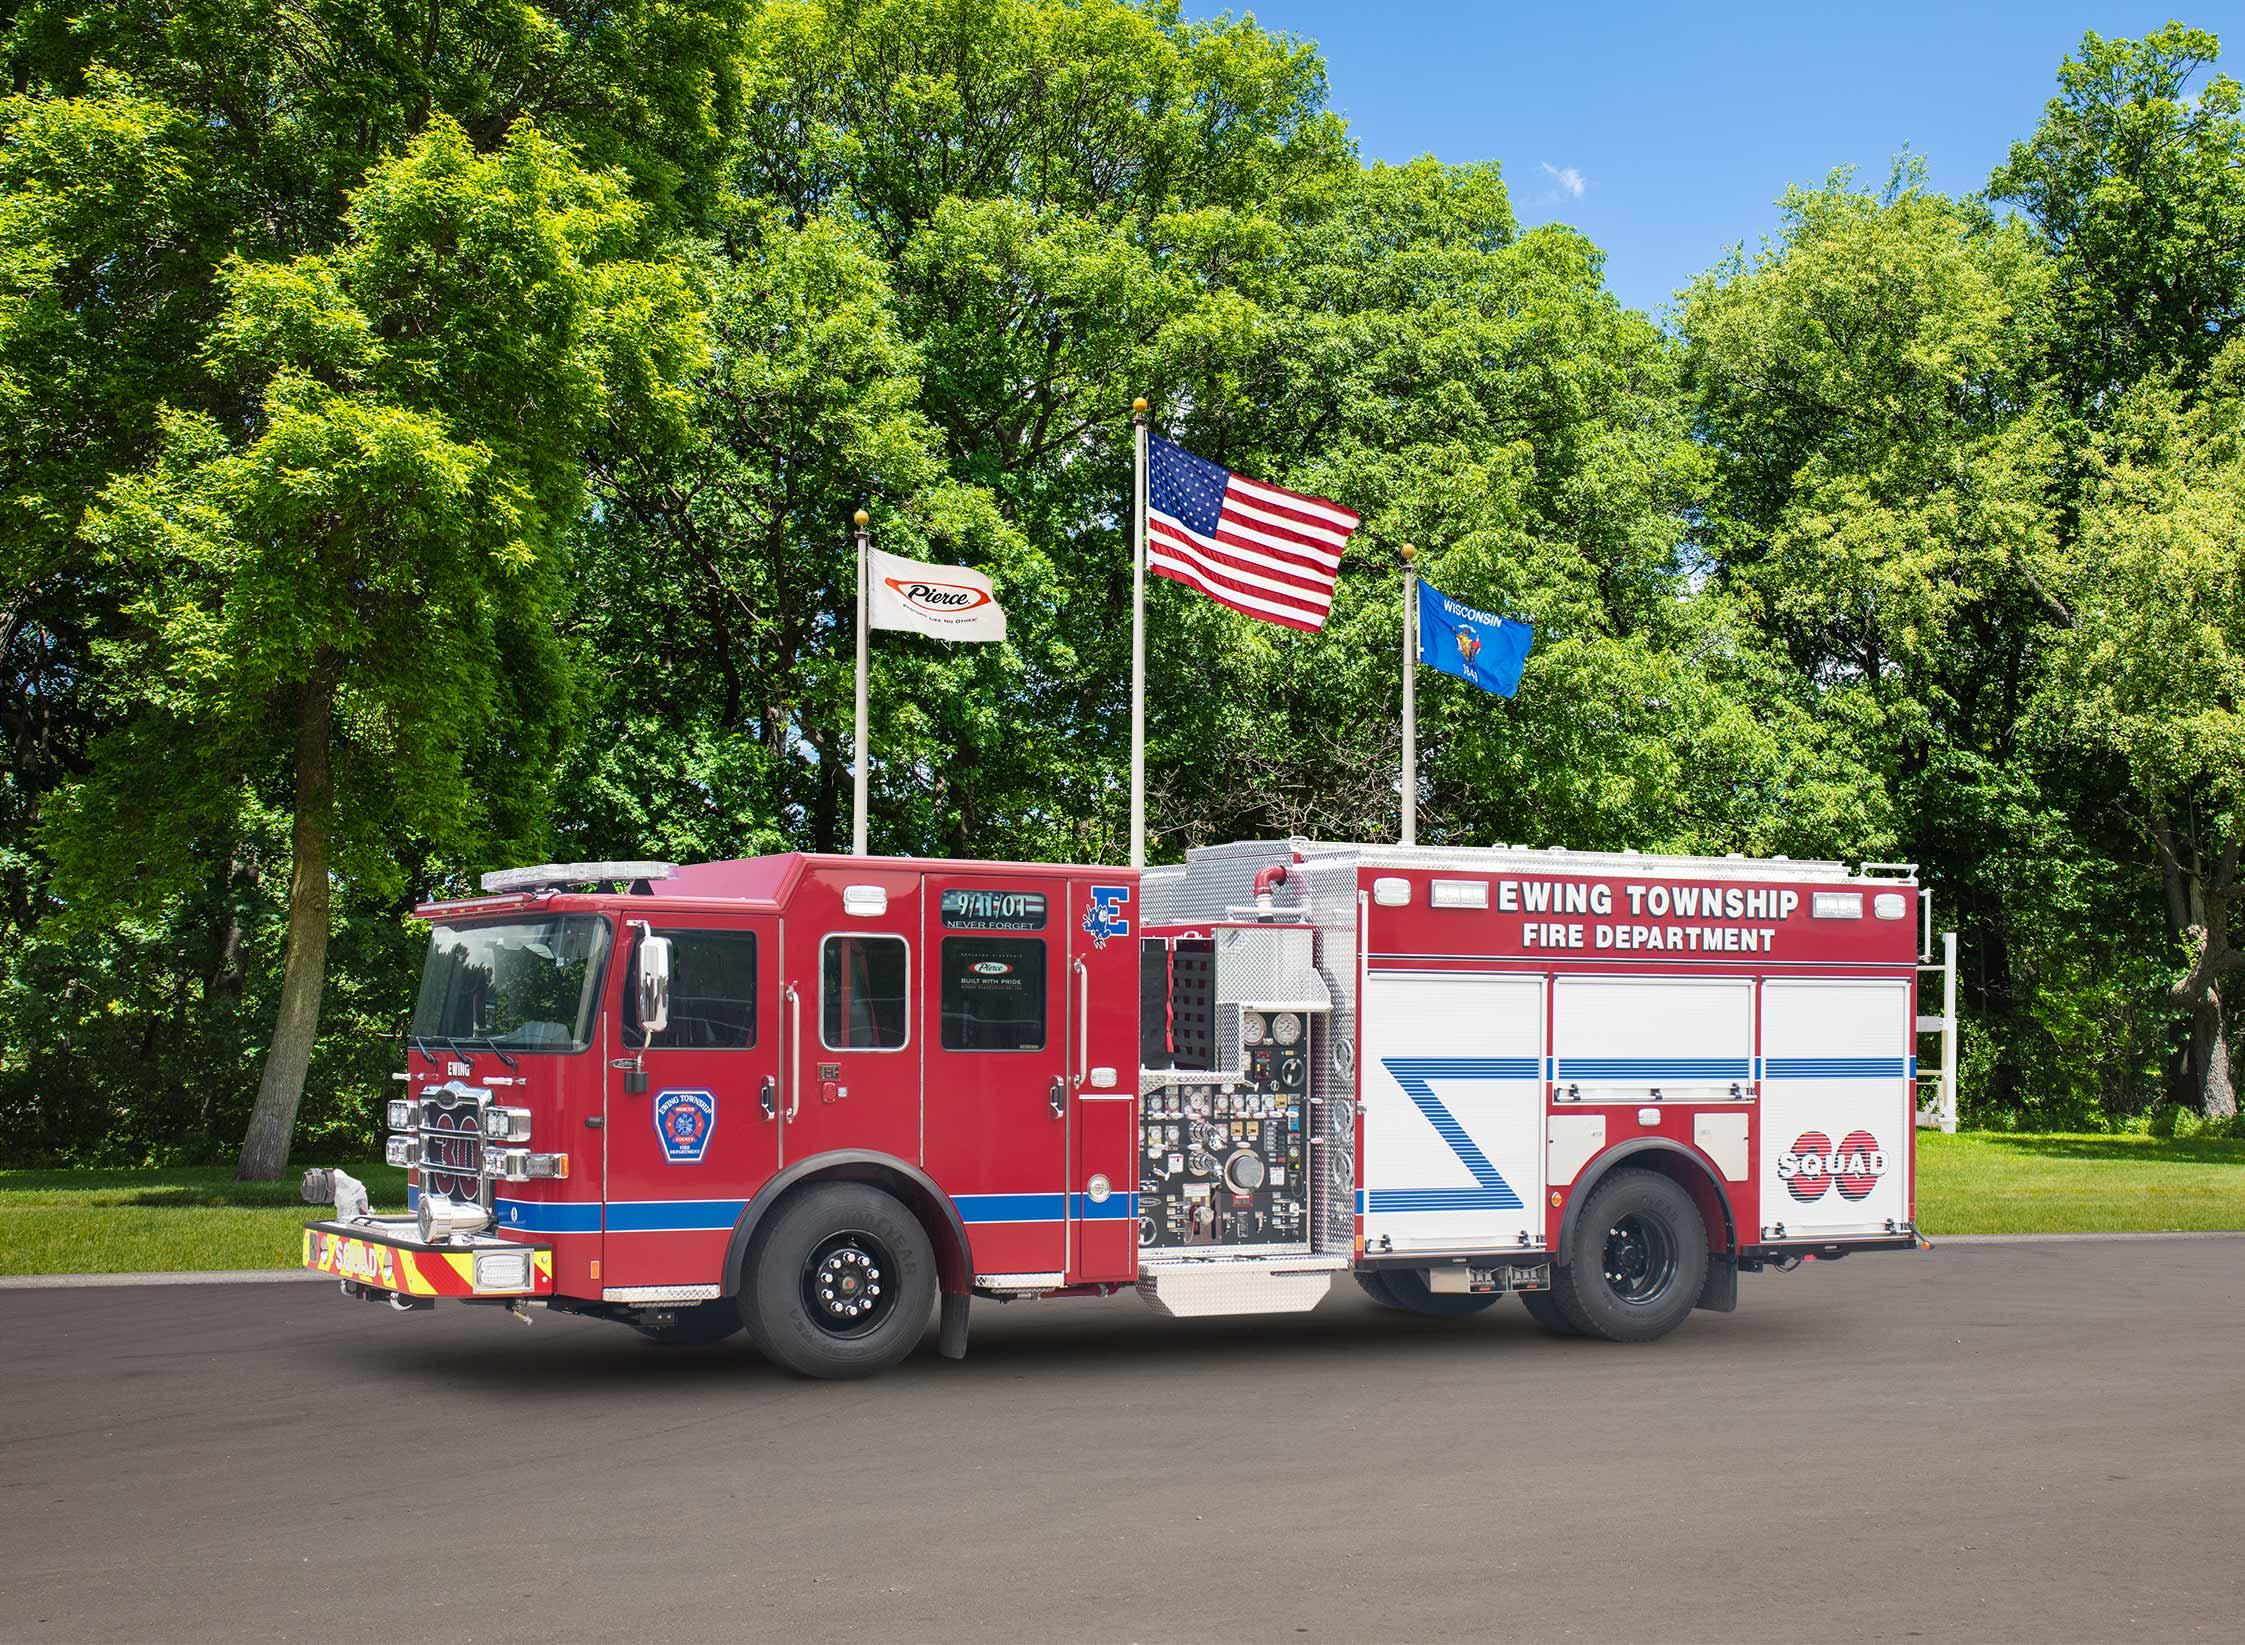 Township of Ewing Fire Department - Pumper